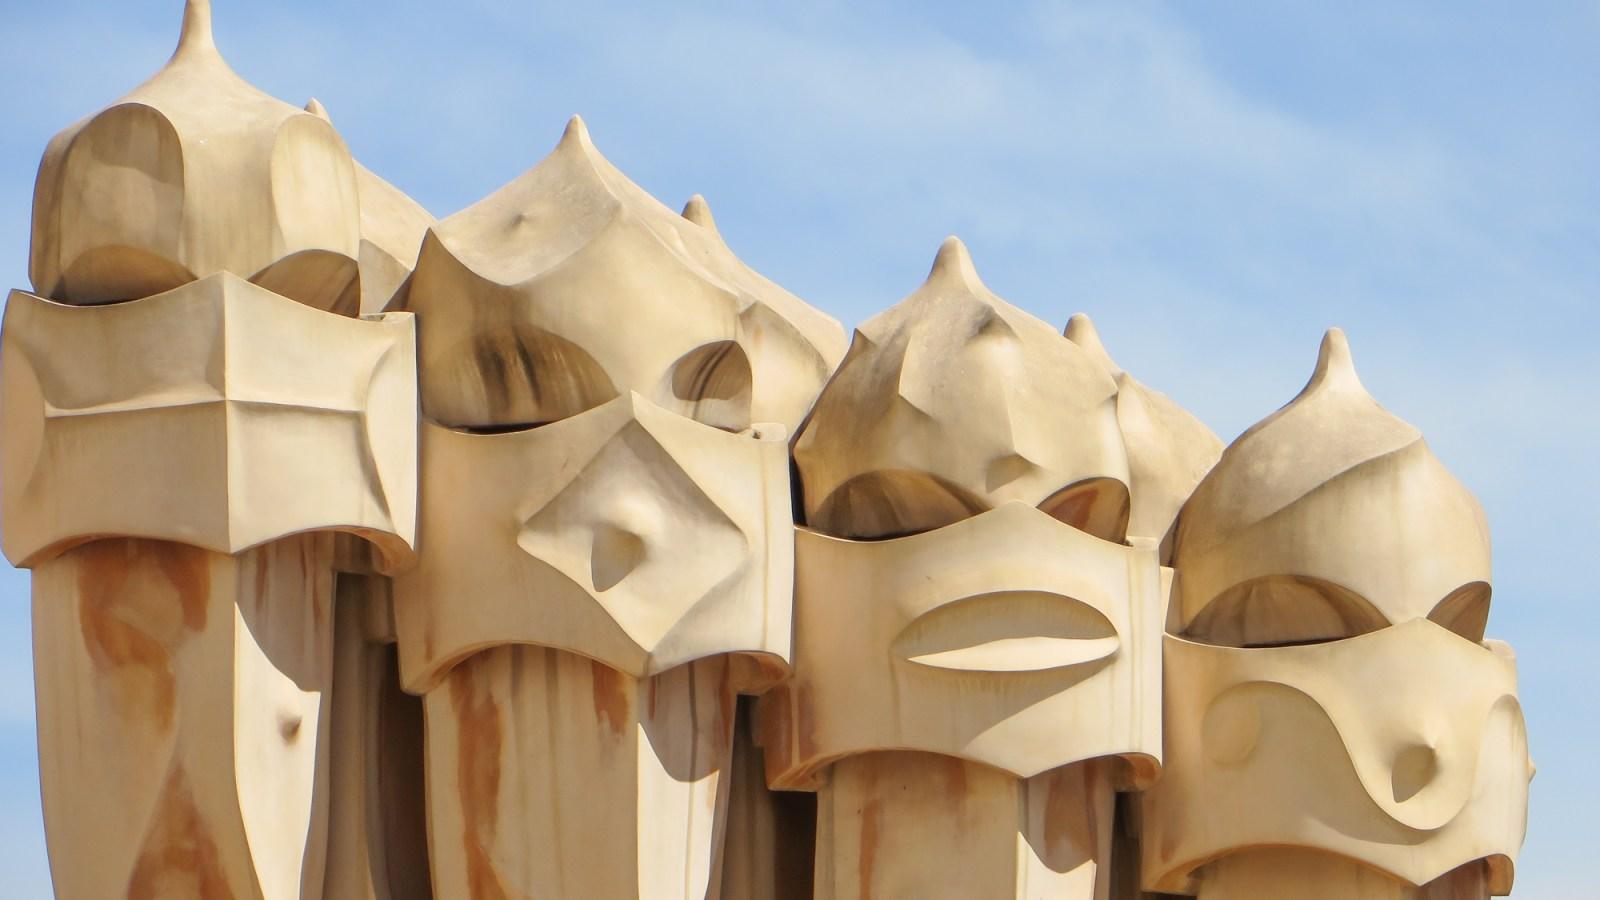 La Pedrera, the Origins - nighttime show at Antoni Gaudi's Casa Mila in Barcelona, Spain